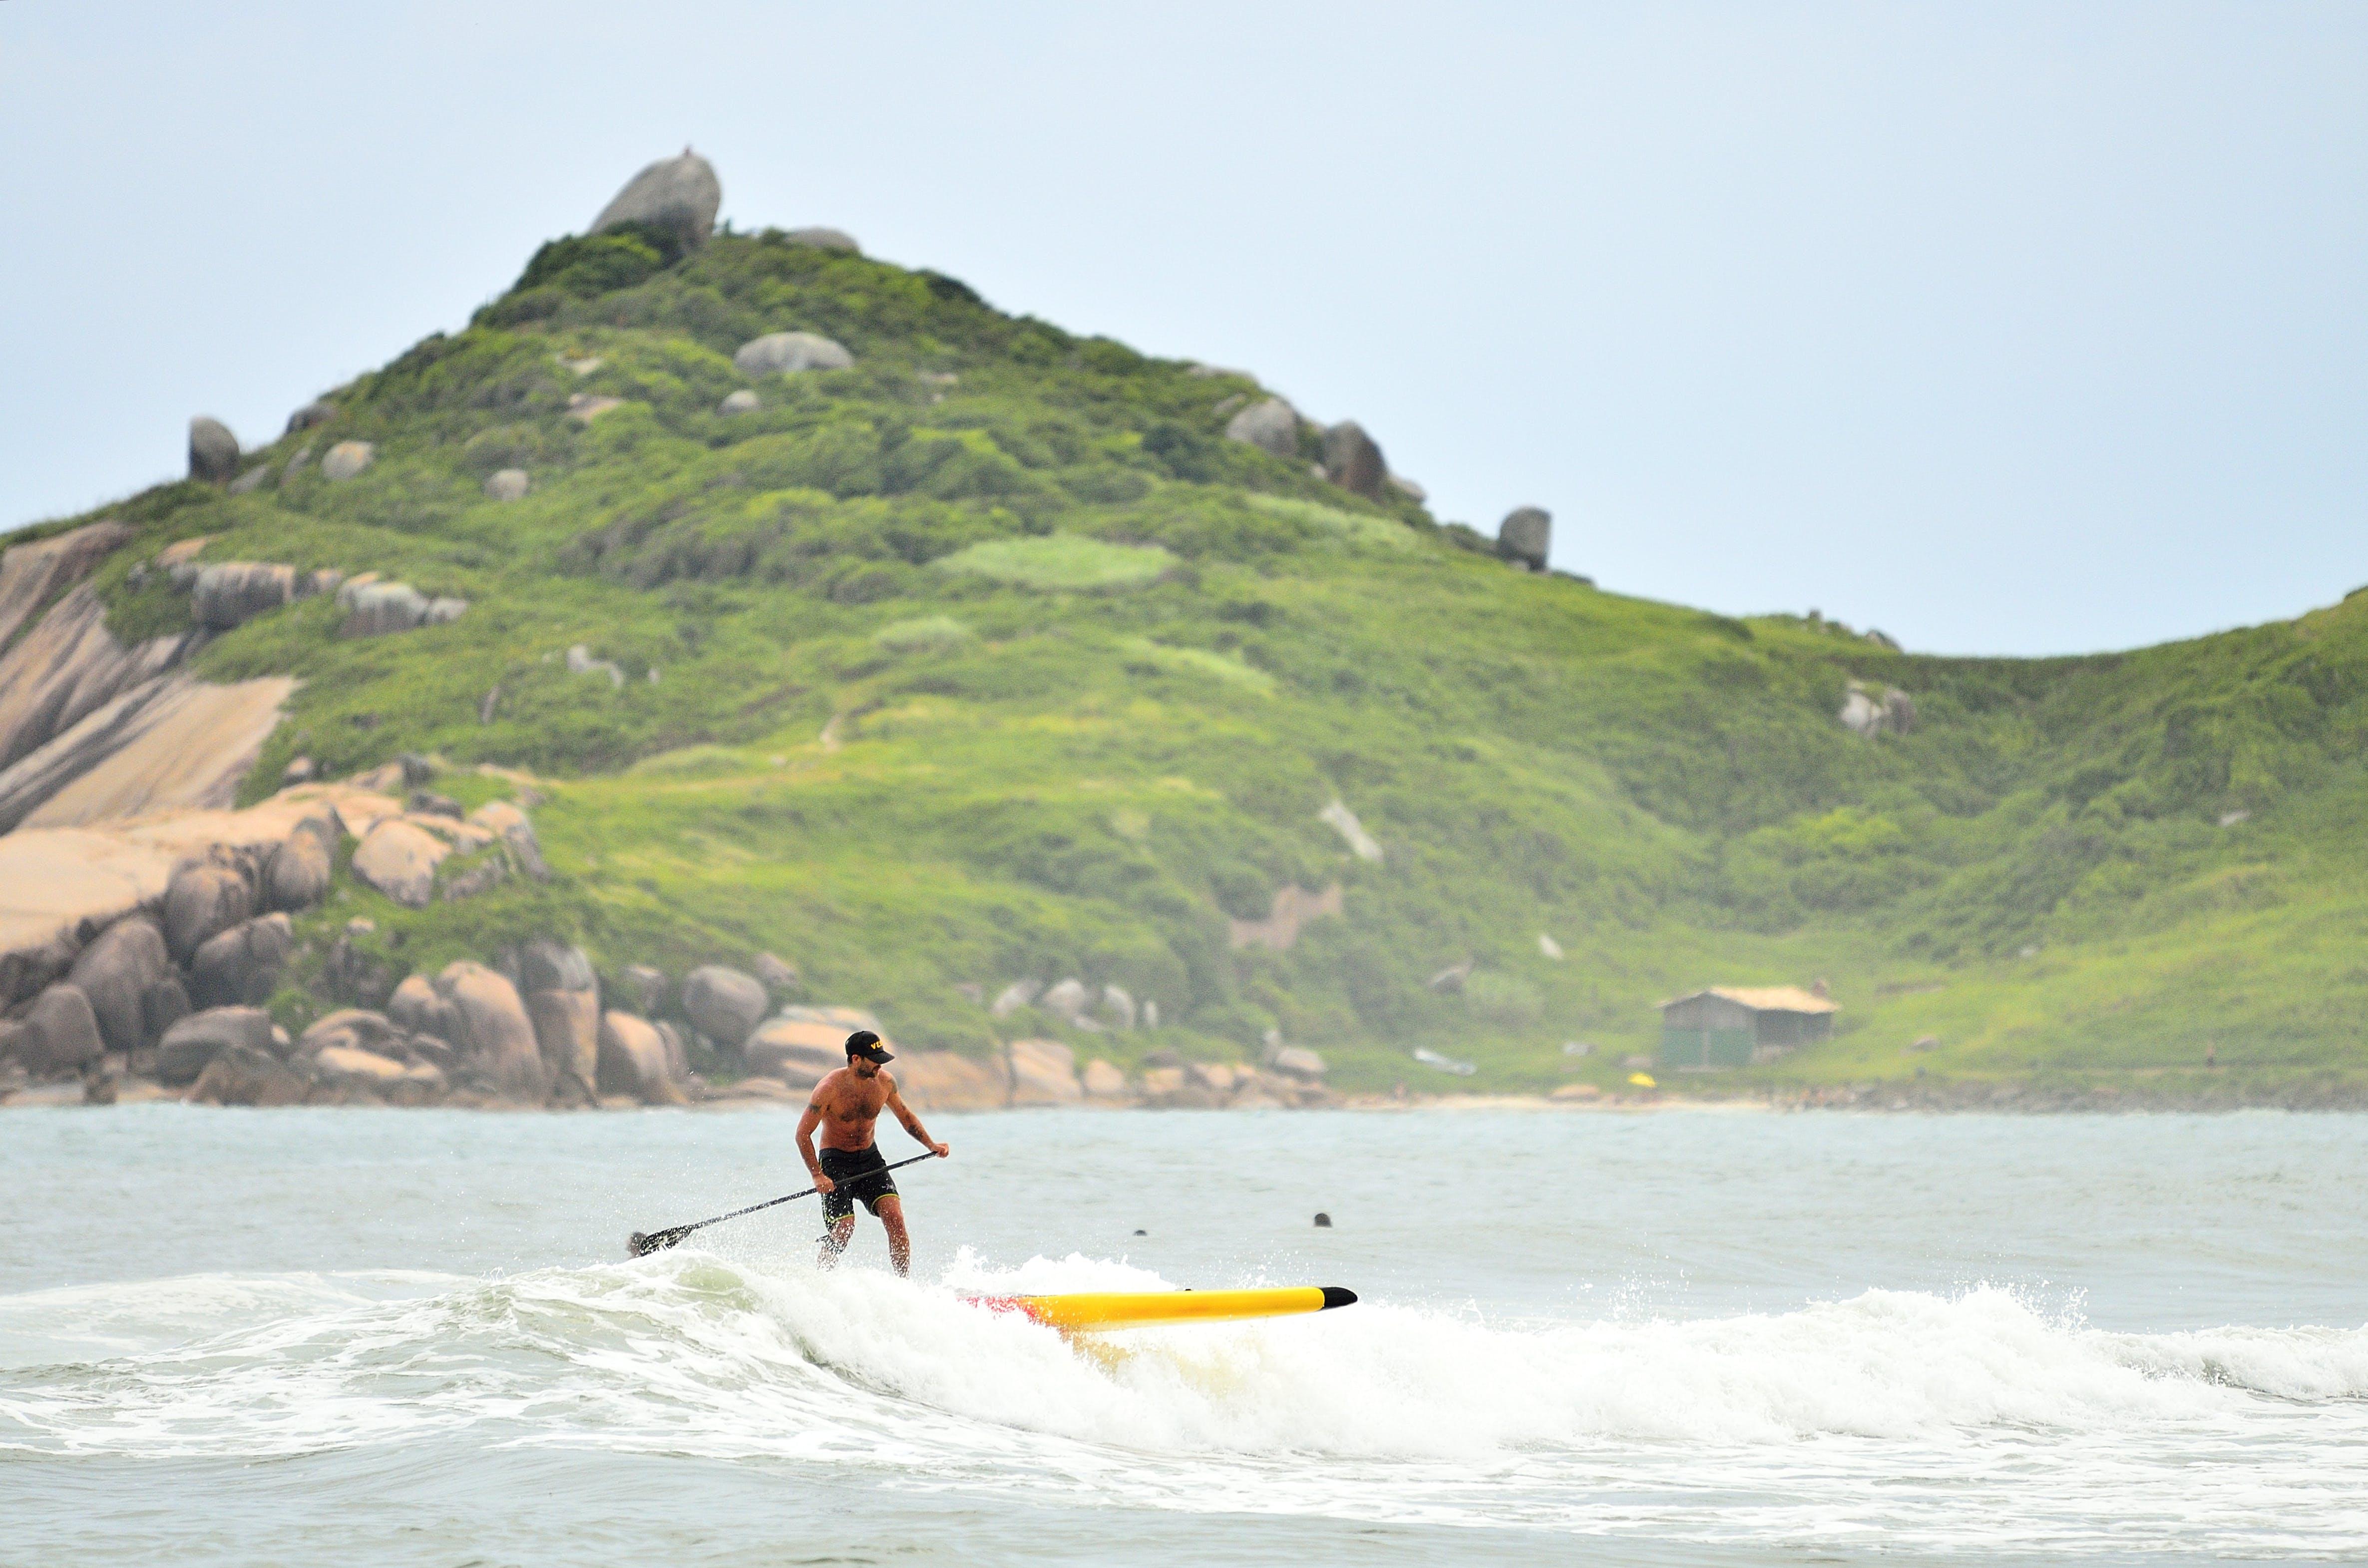 Man in Black Shorts Surfing Under Blue Sky during Daytime